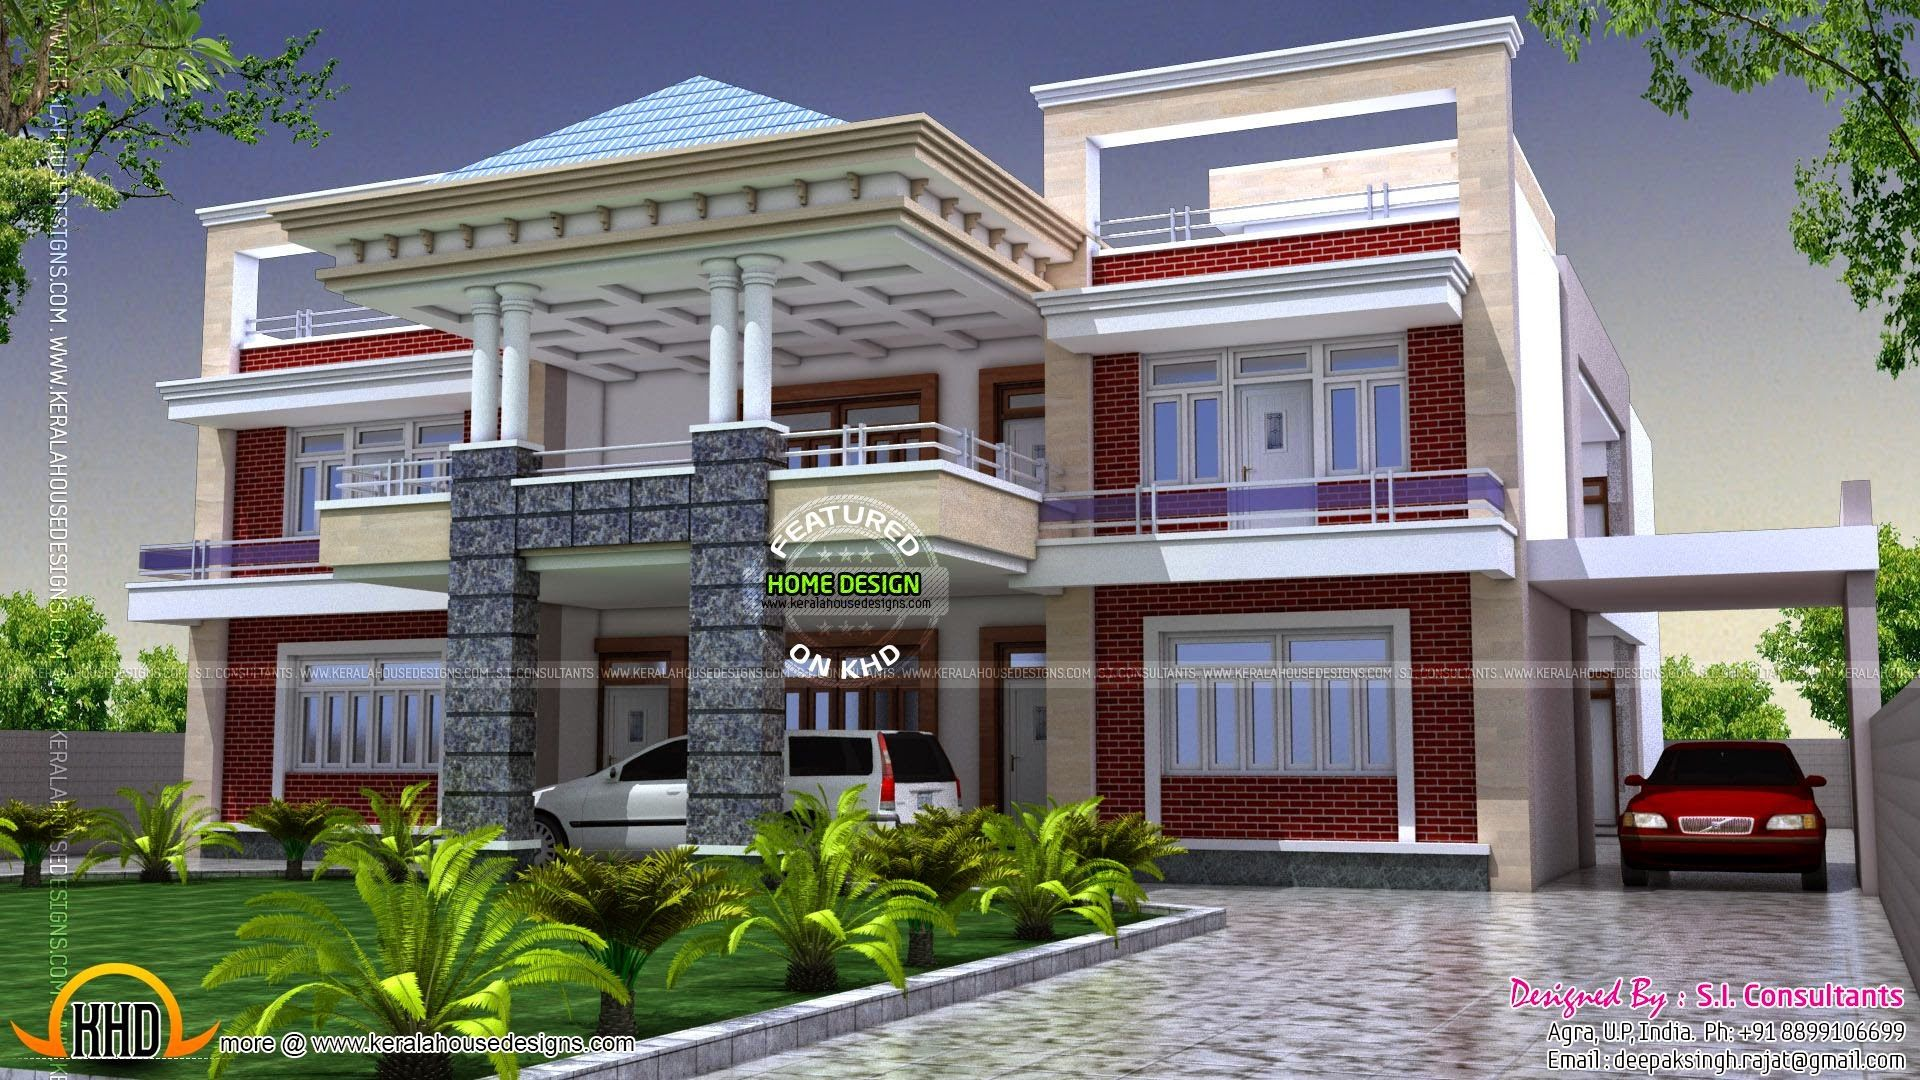 duplex house exterior designs in india Home Design 39+ Duplex House Exterior Designs In India PNG